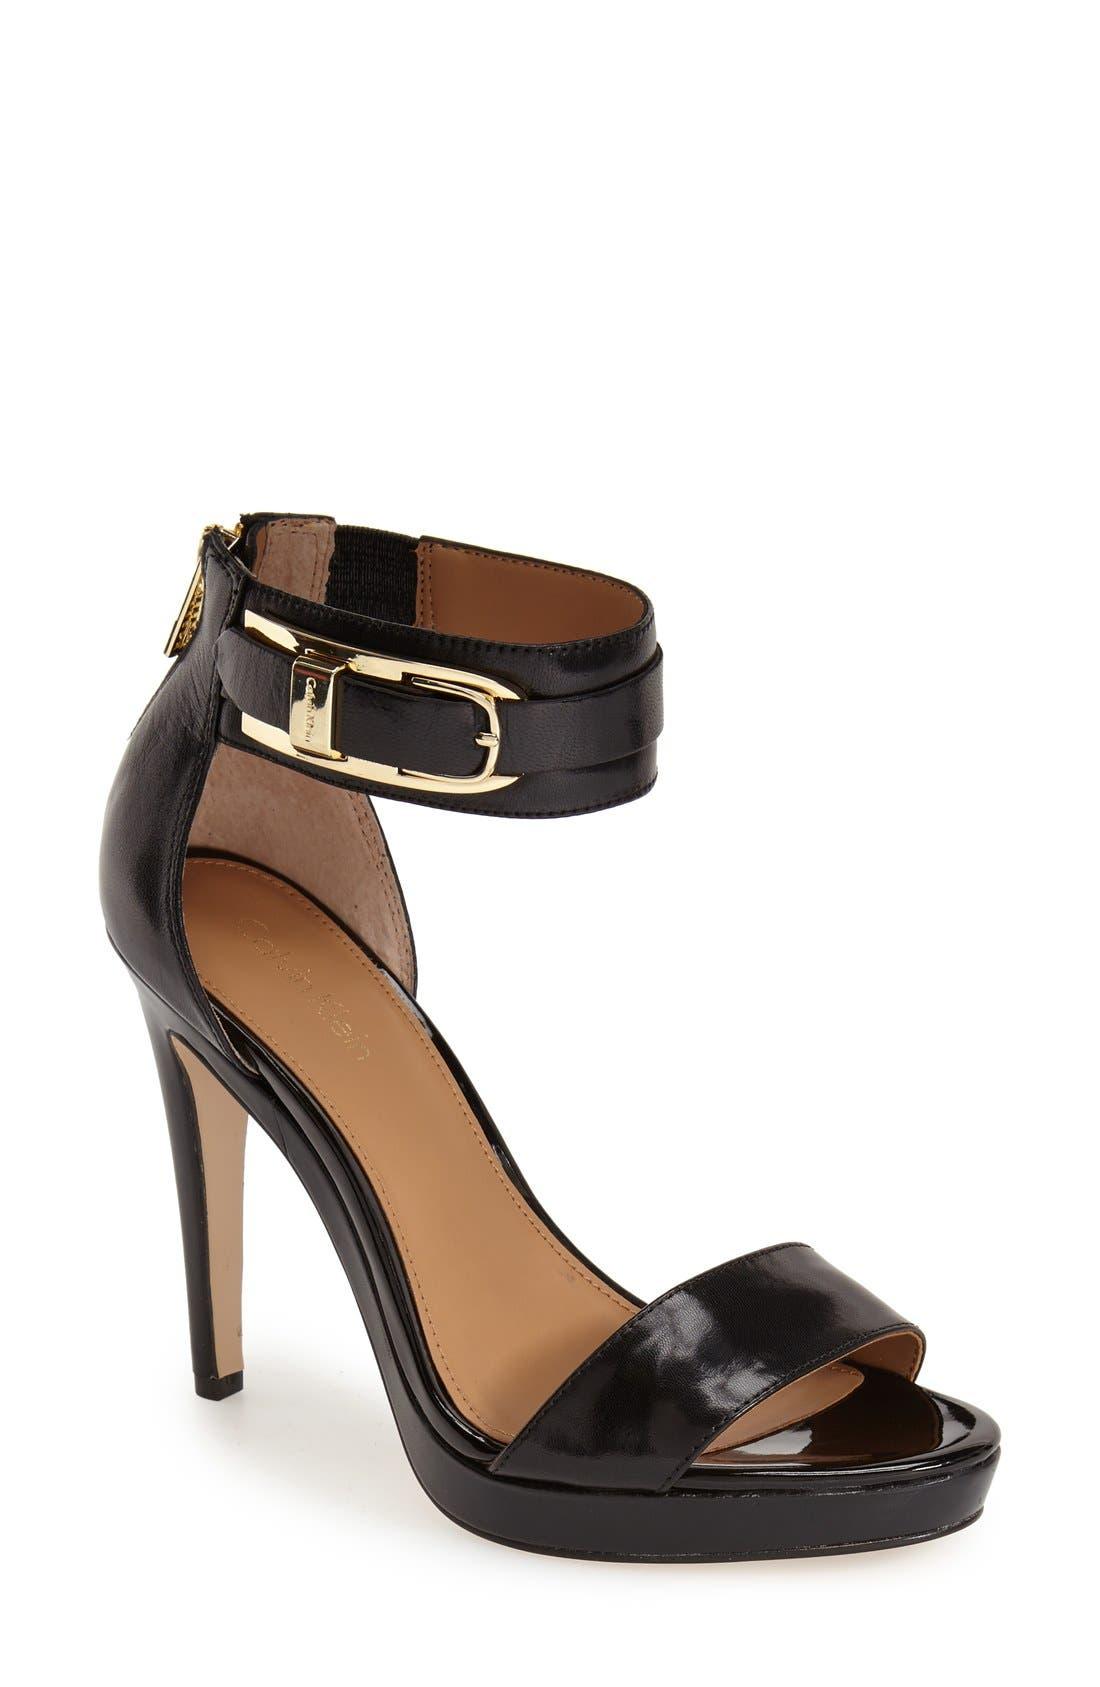 Alternate Image 1 Selected - Calvin Klein 'Panthea' Ankle Strap Sandal (Women)